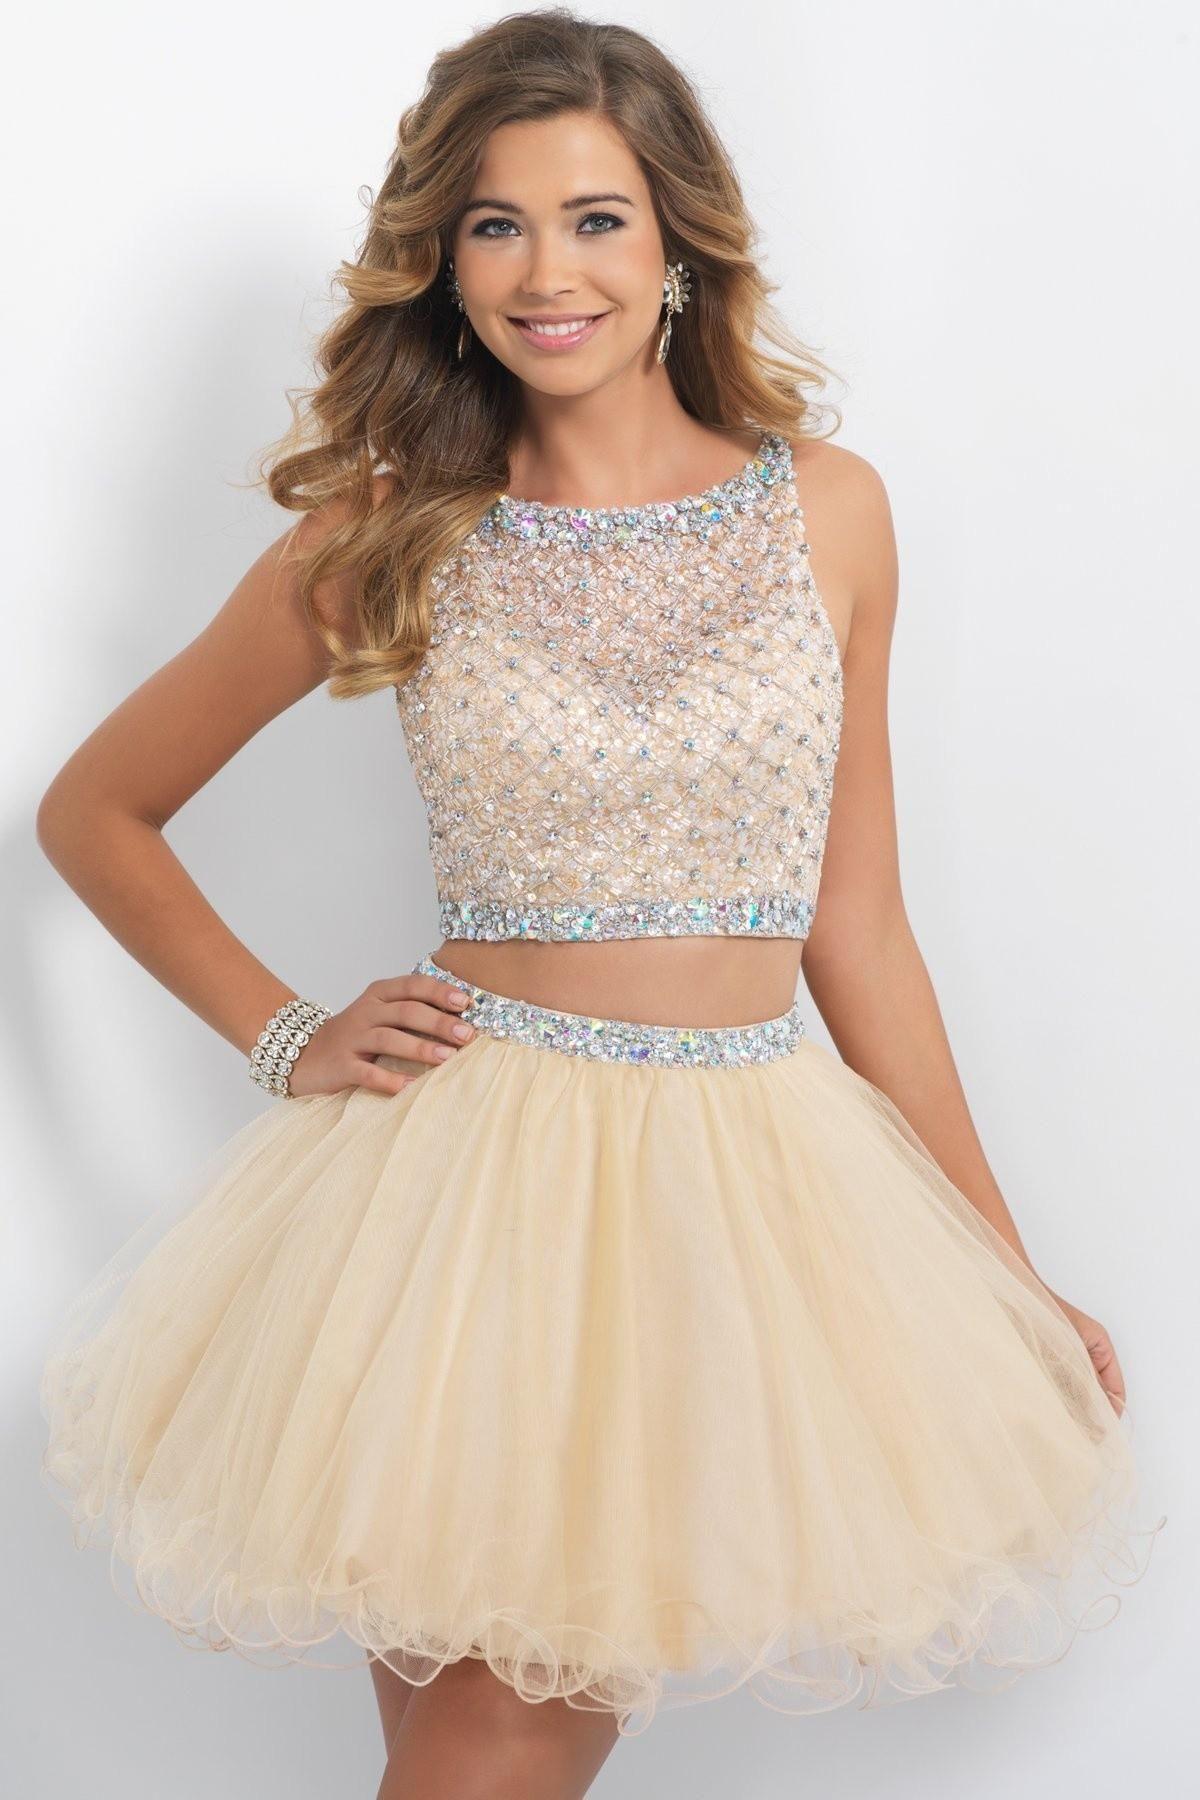 Pin by pranali netam on dress in pinterest vestidos